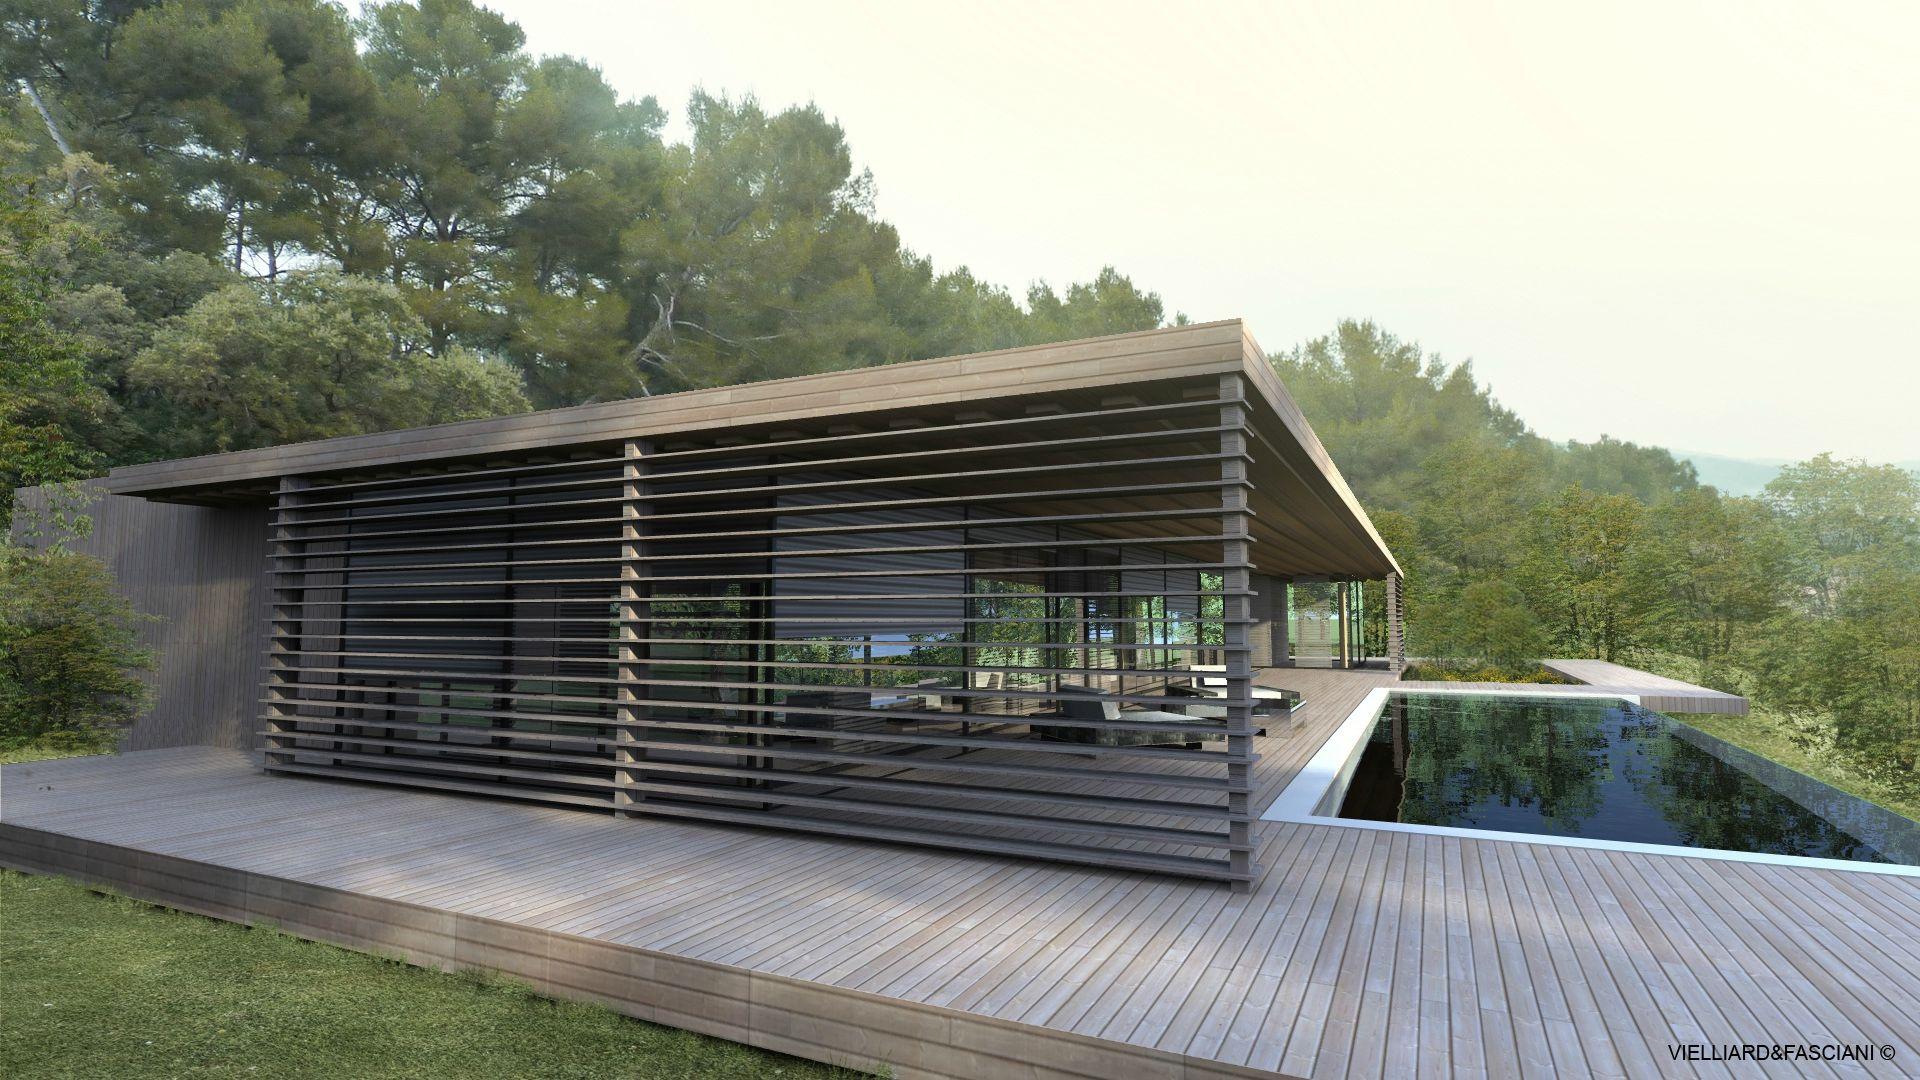 Vielliard fasciani maison contemporaine aix en provence smj 2